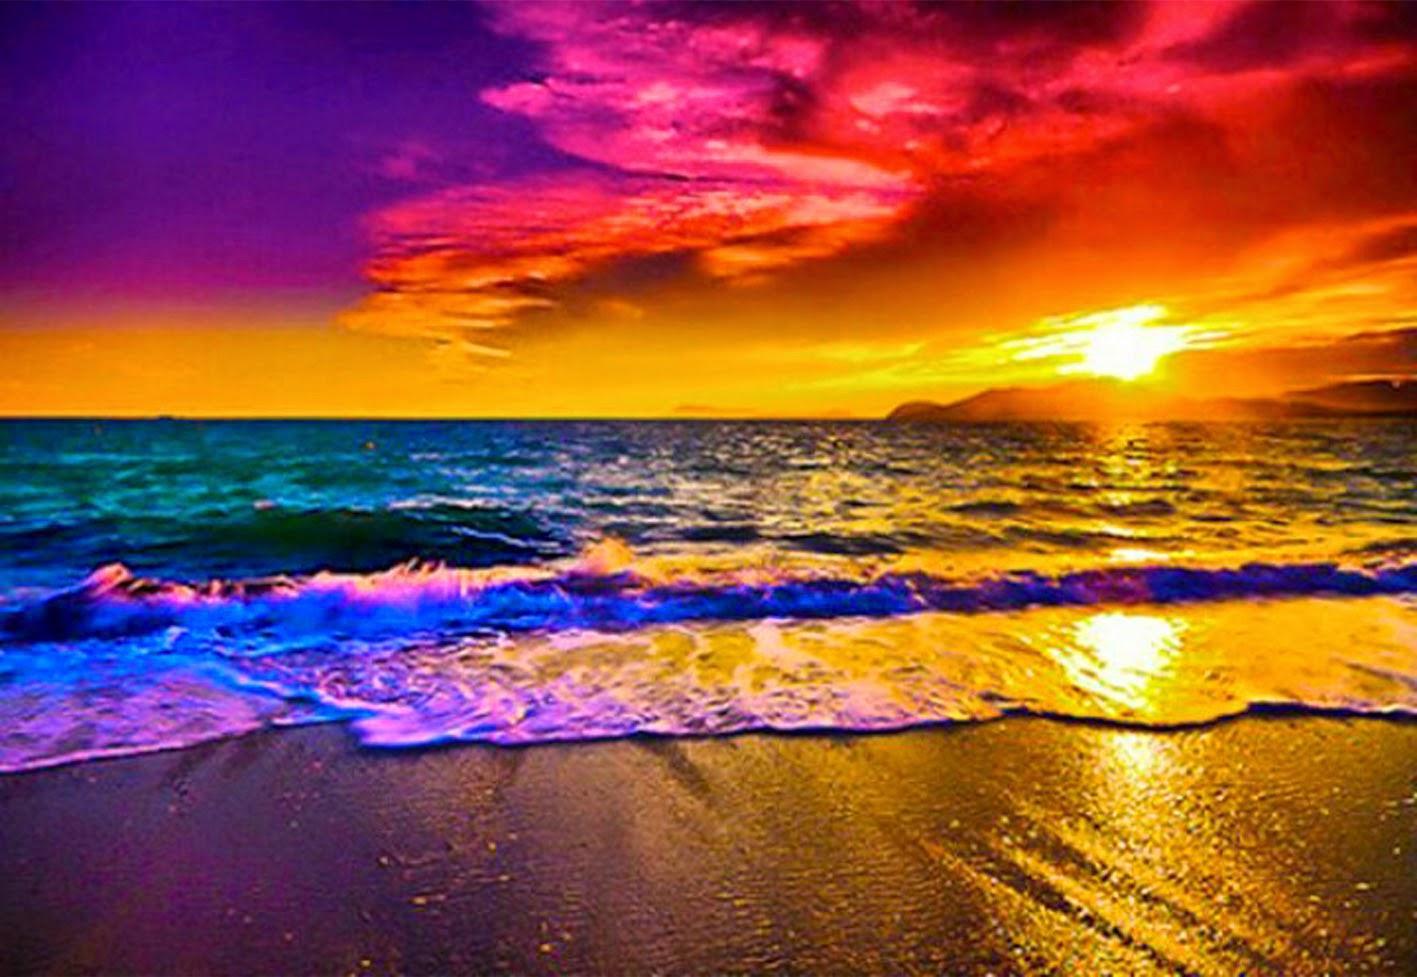 Beach Sunset Rainbow Wallpapers - Wallpaper Cave